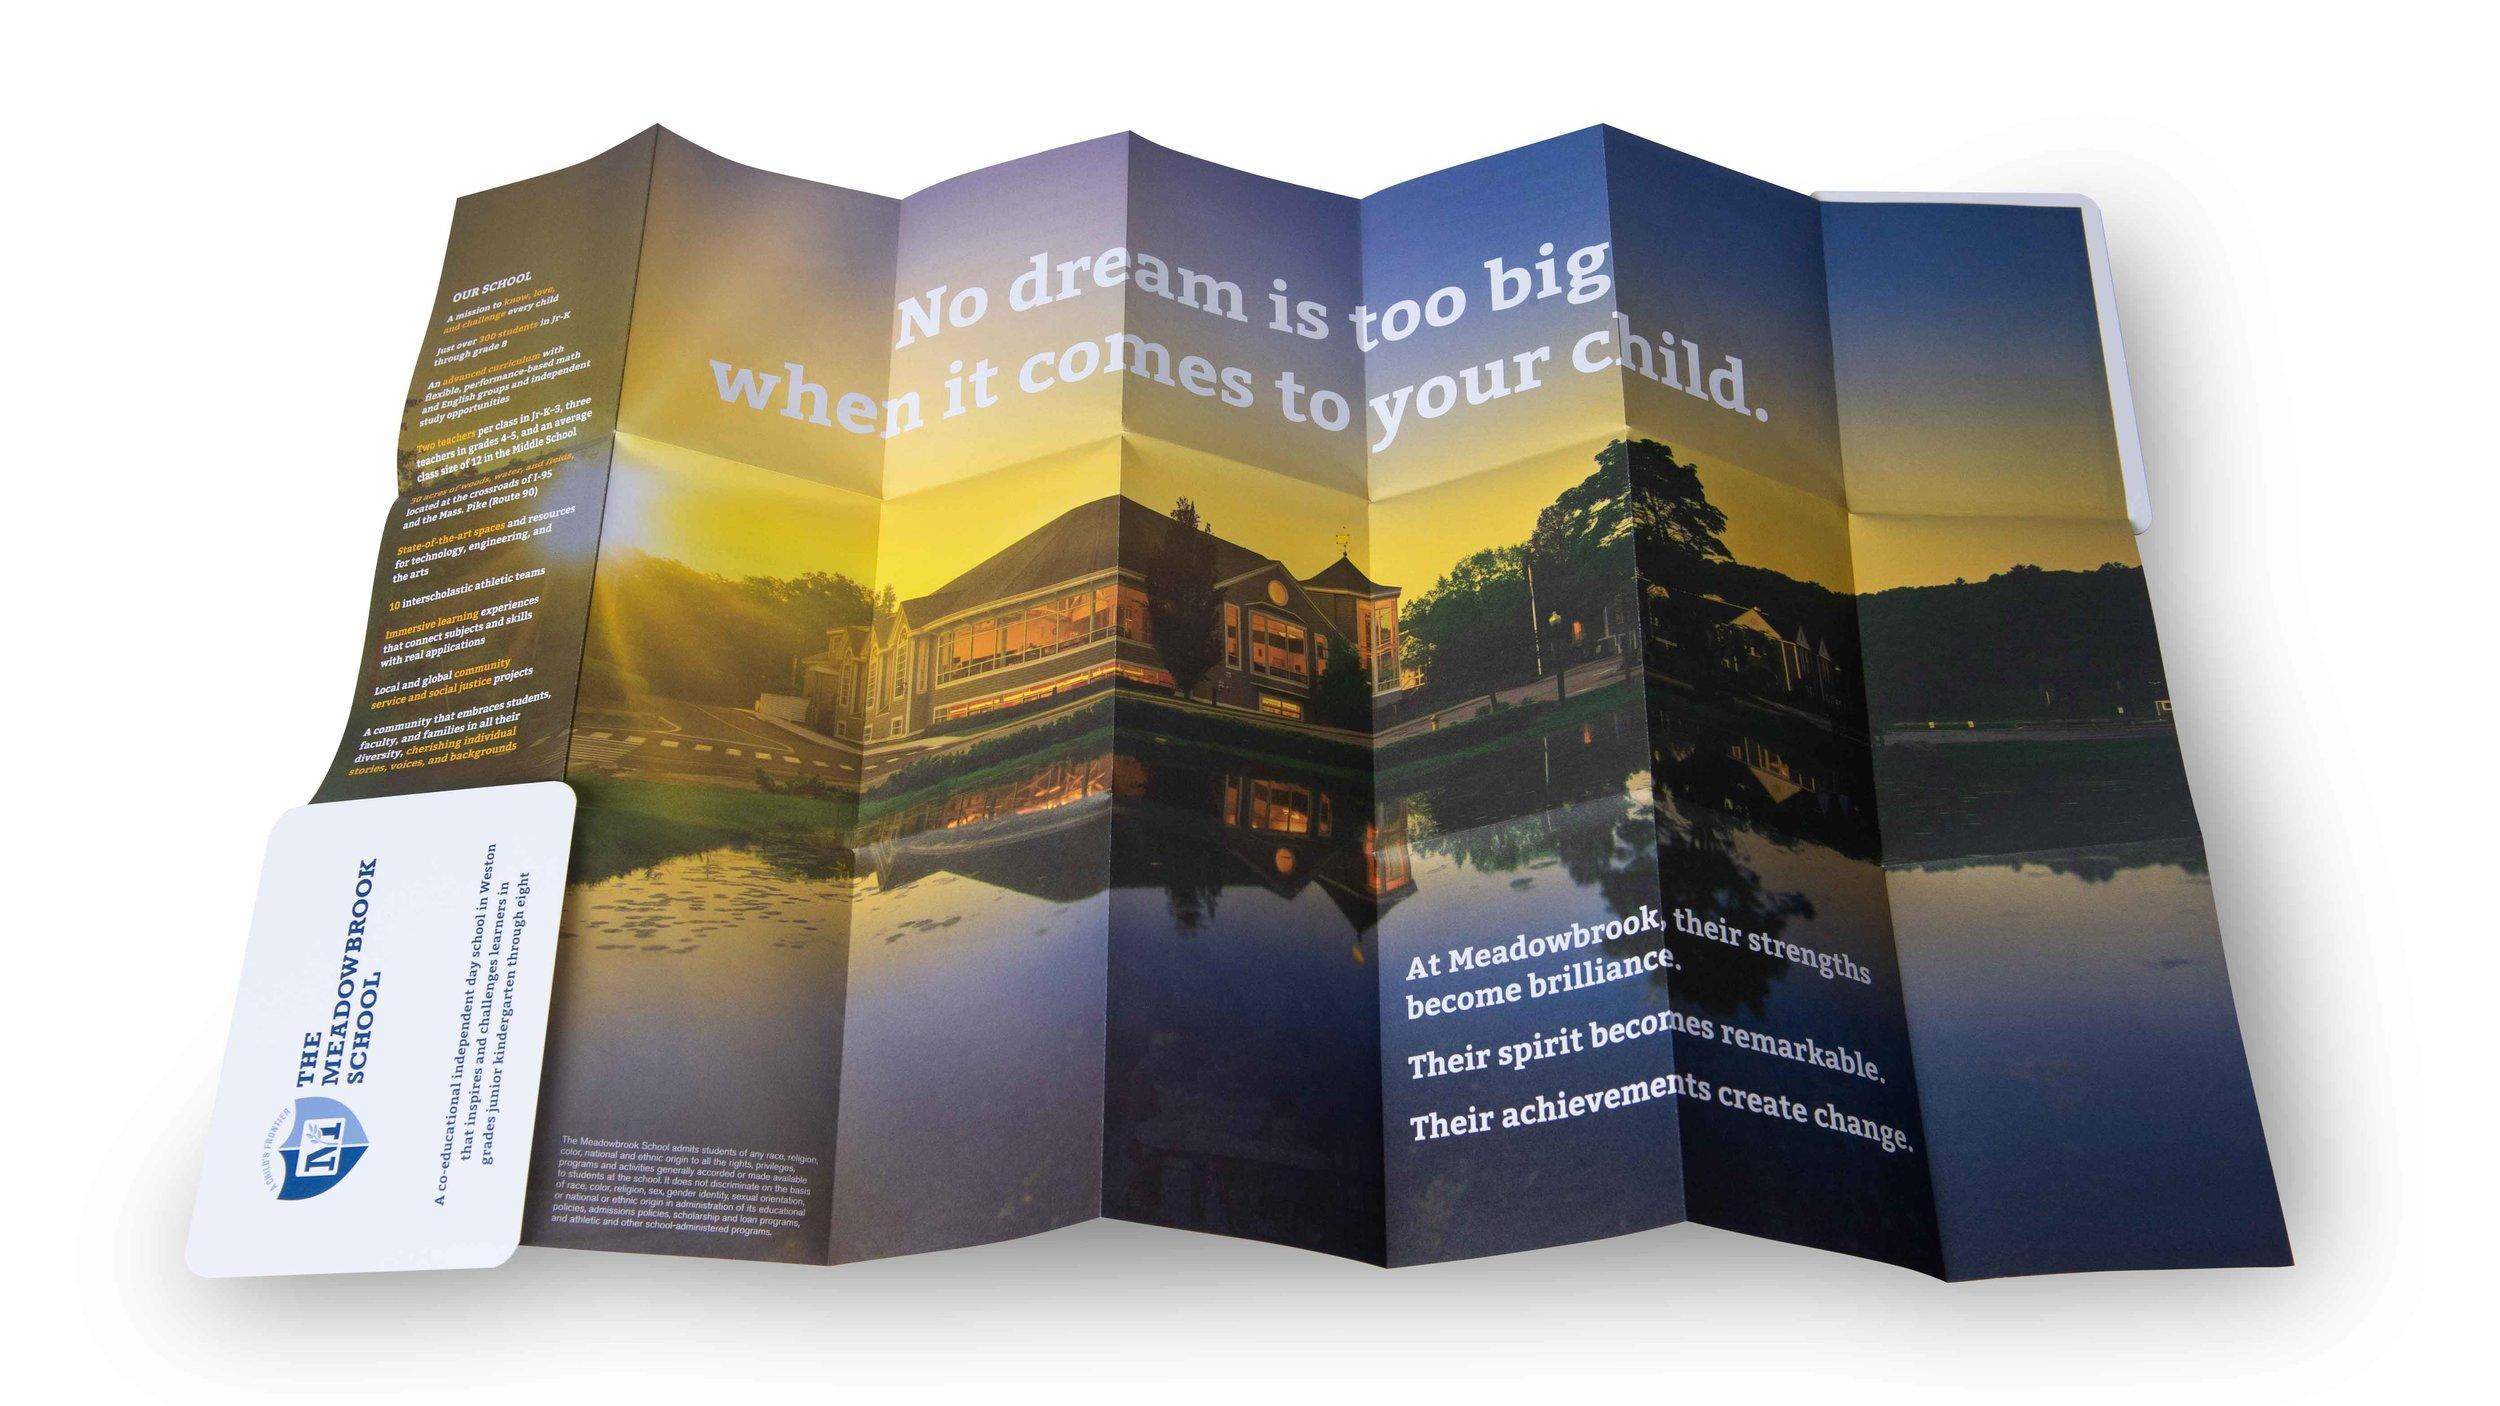 Meadowbrook-School-Creosote-Affects-Travel-Brochure-3.jpg